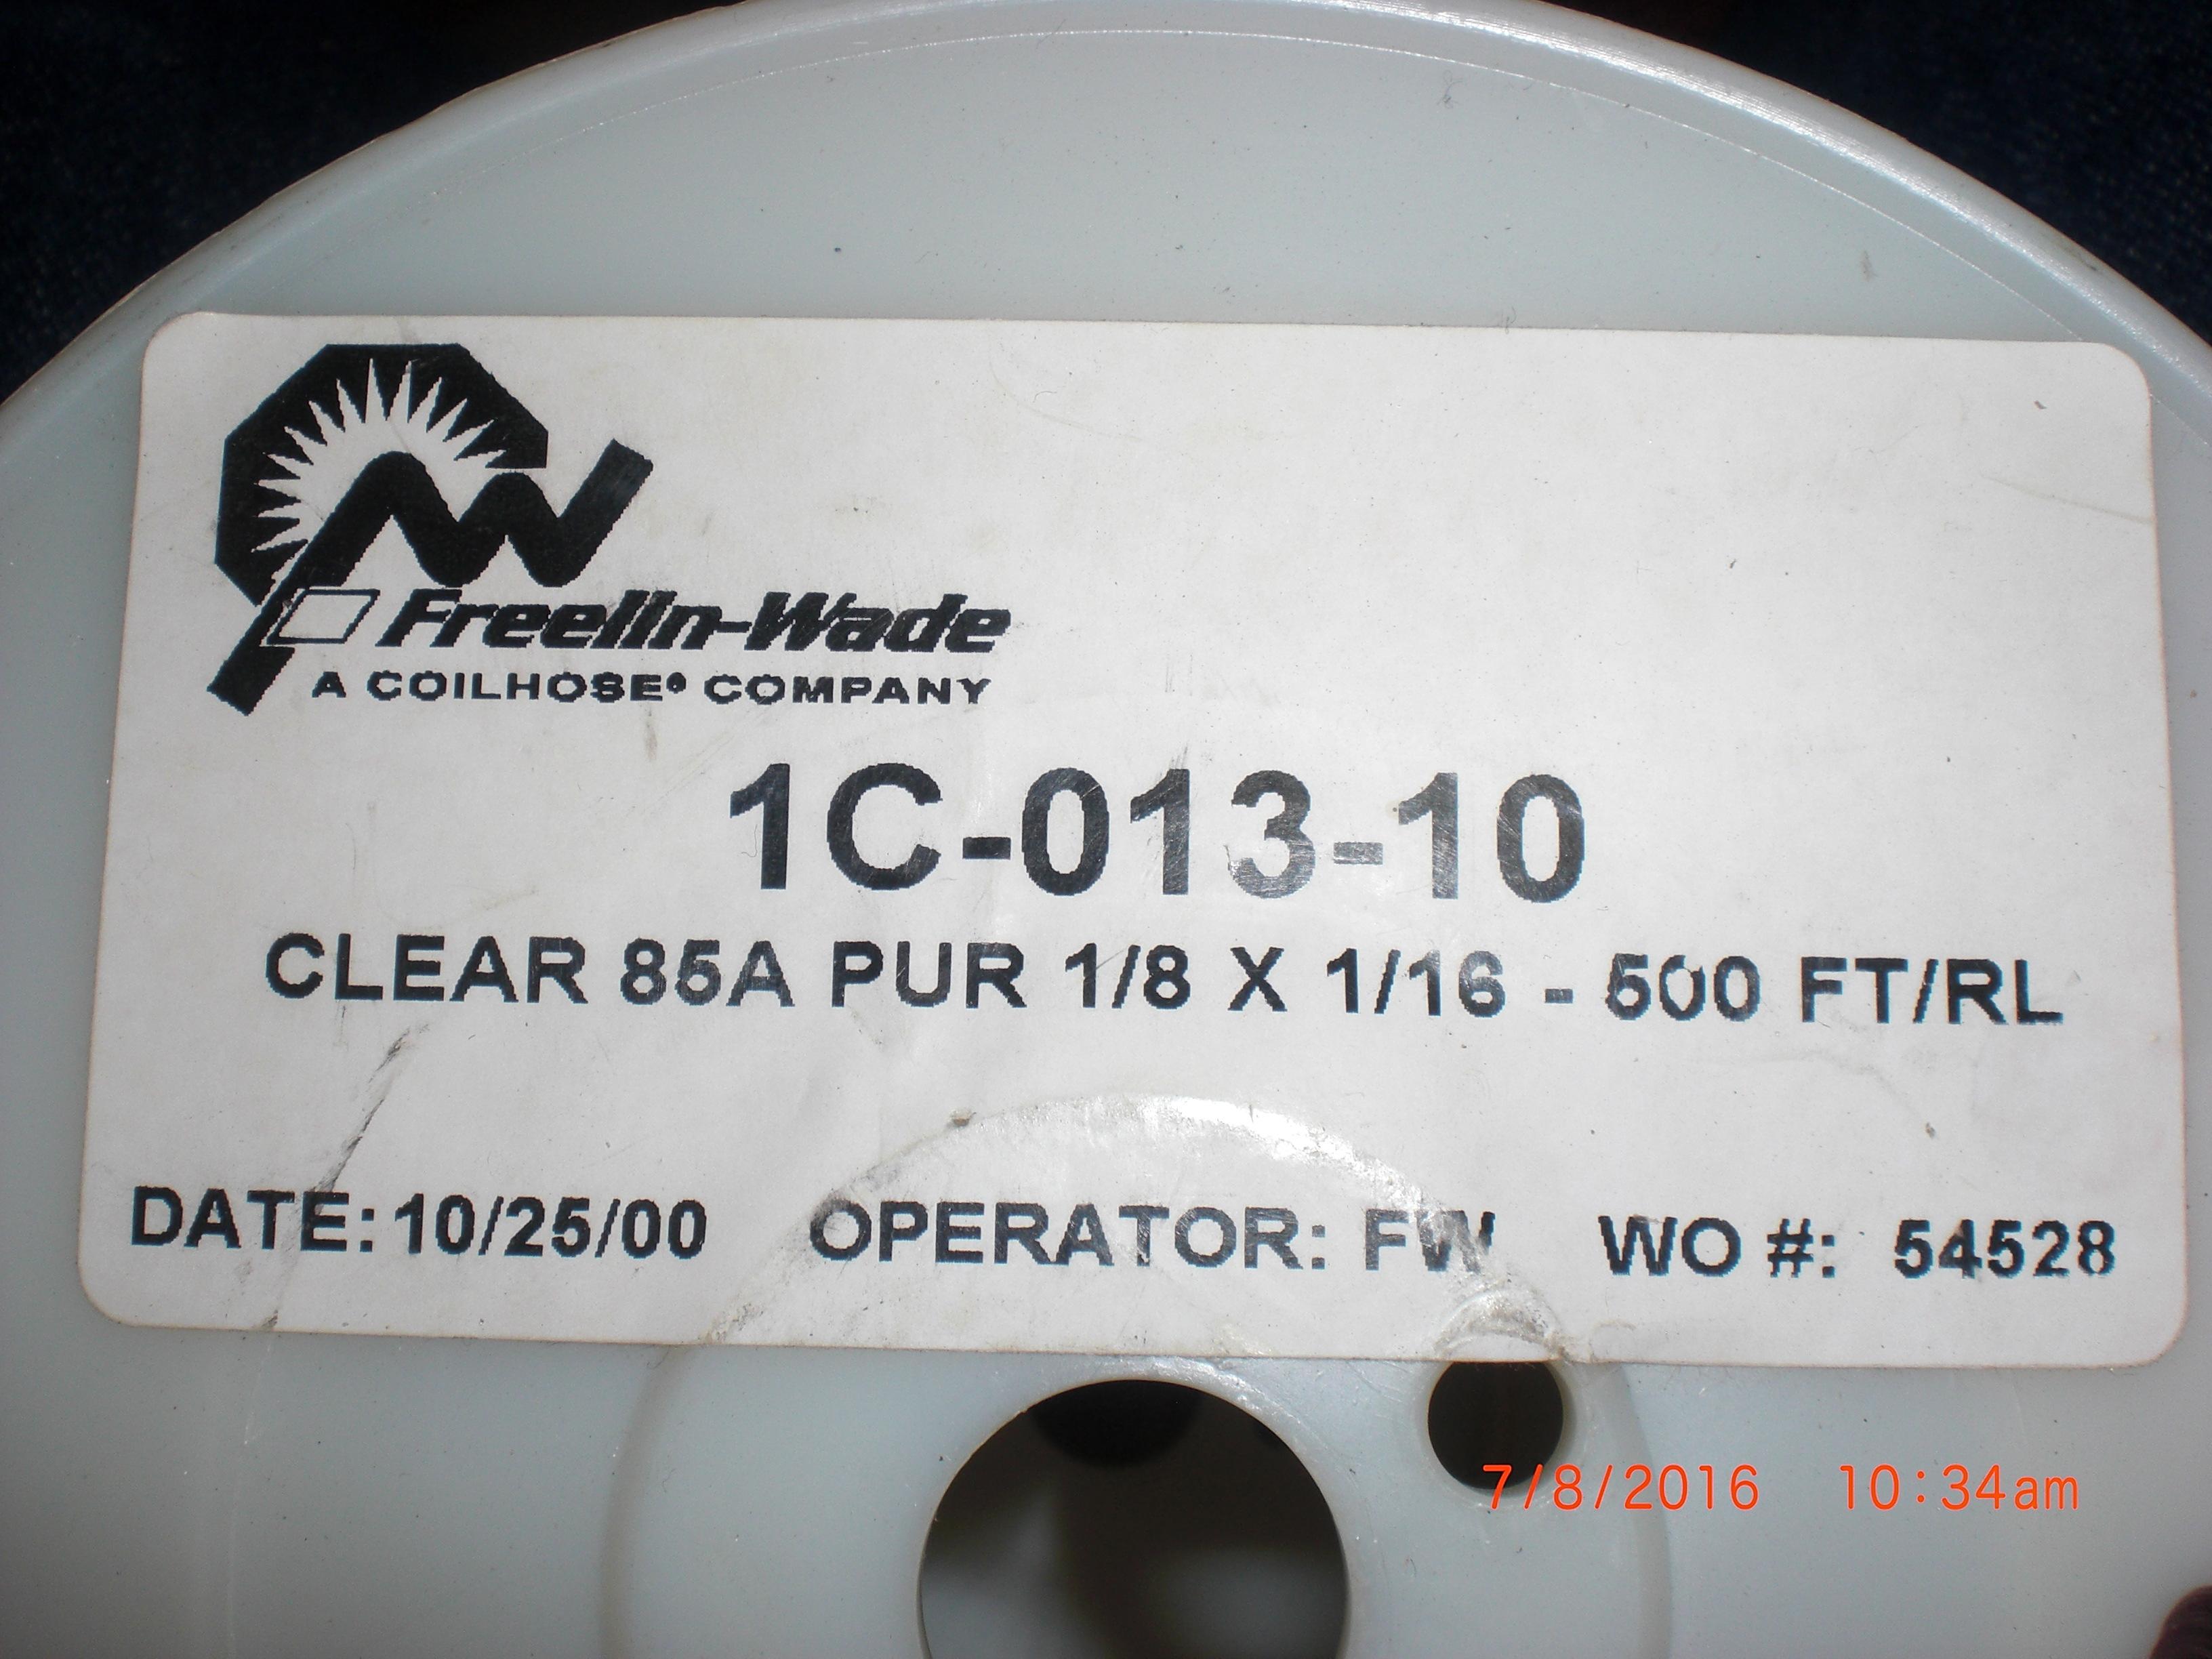 Tubing FREELIN-WADE 1C-013-10 Tube 400ft Clear Polyurethane  85A PUR 1/8 x 1/16